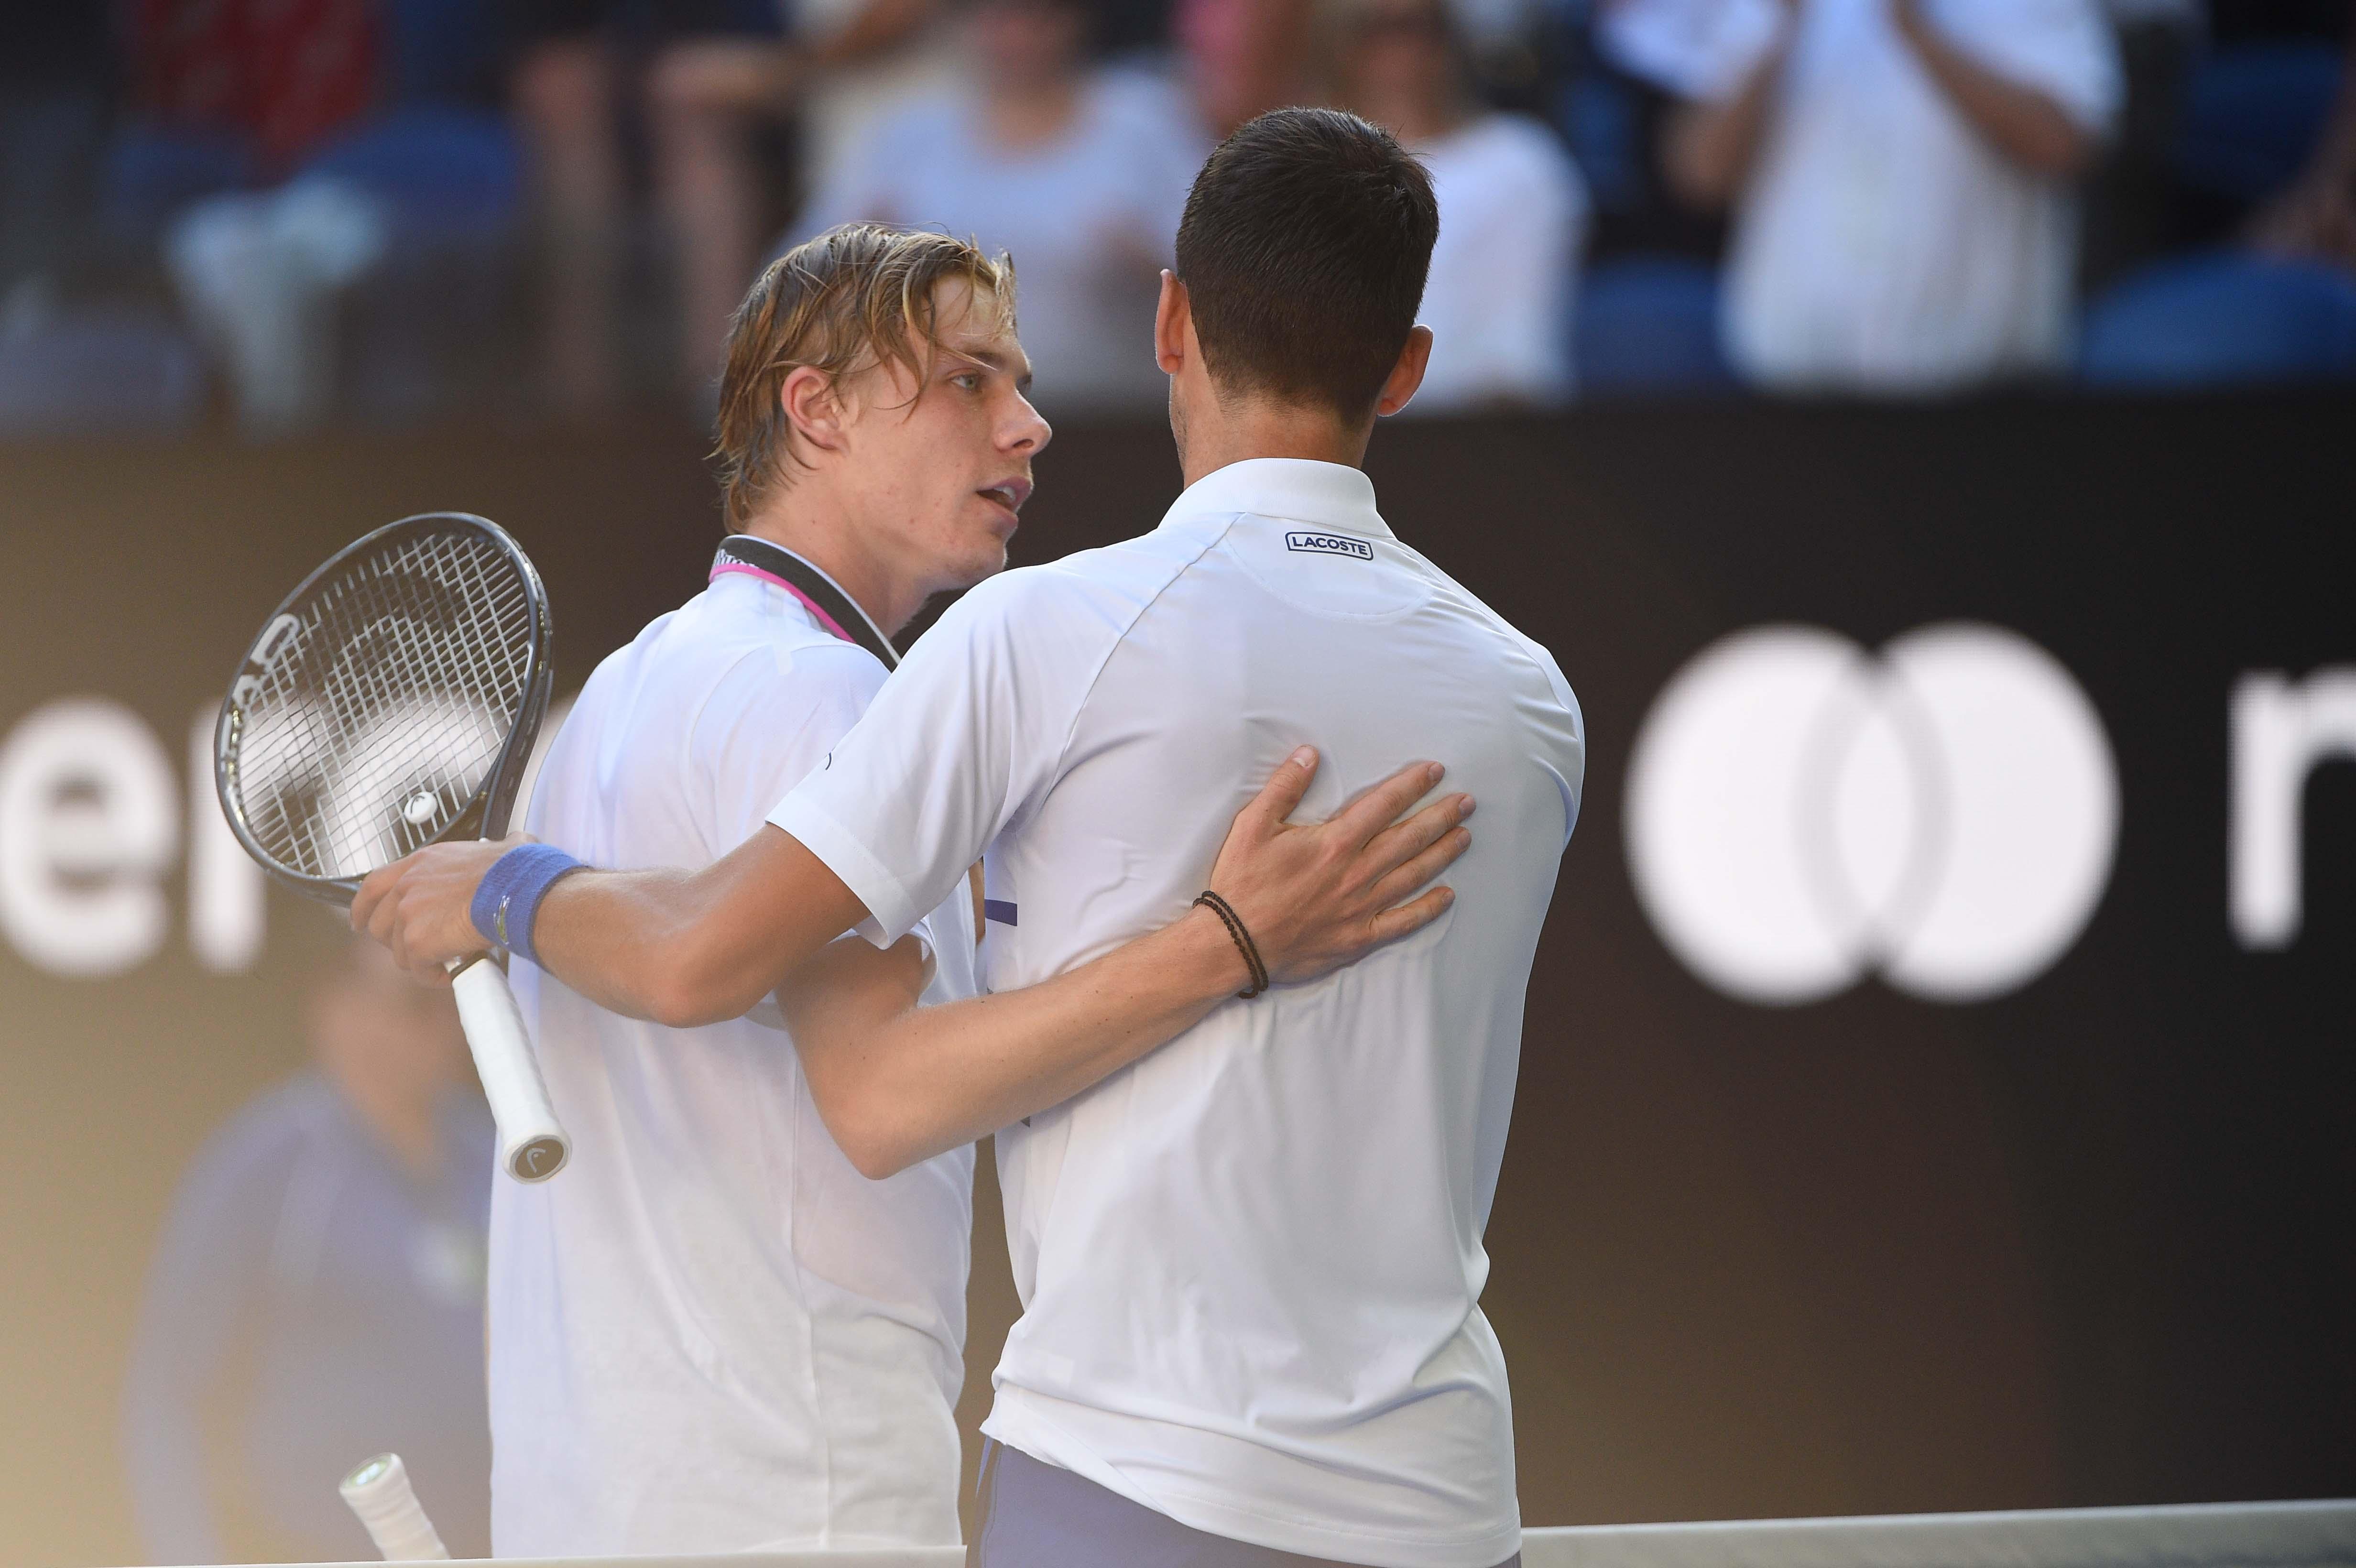 Denis Shapovalov congratuling Novak Djokovic at the net during the Australian Open 2019.